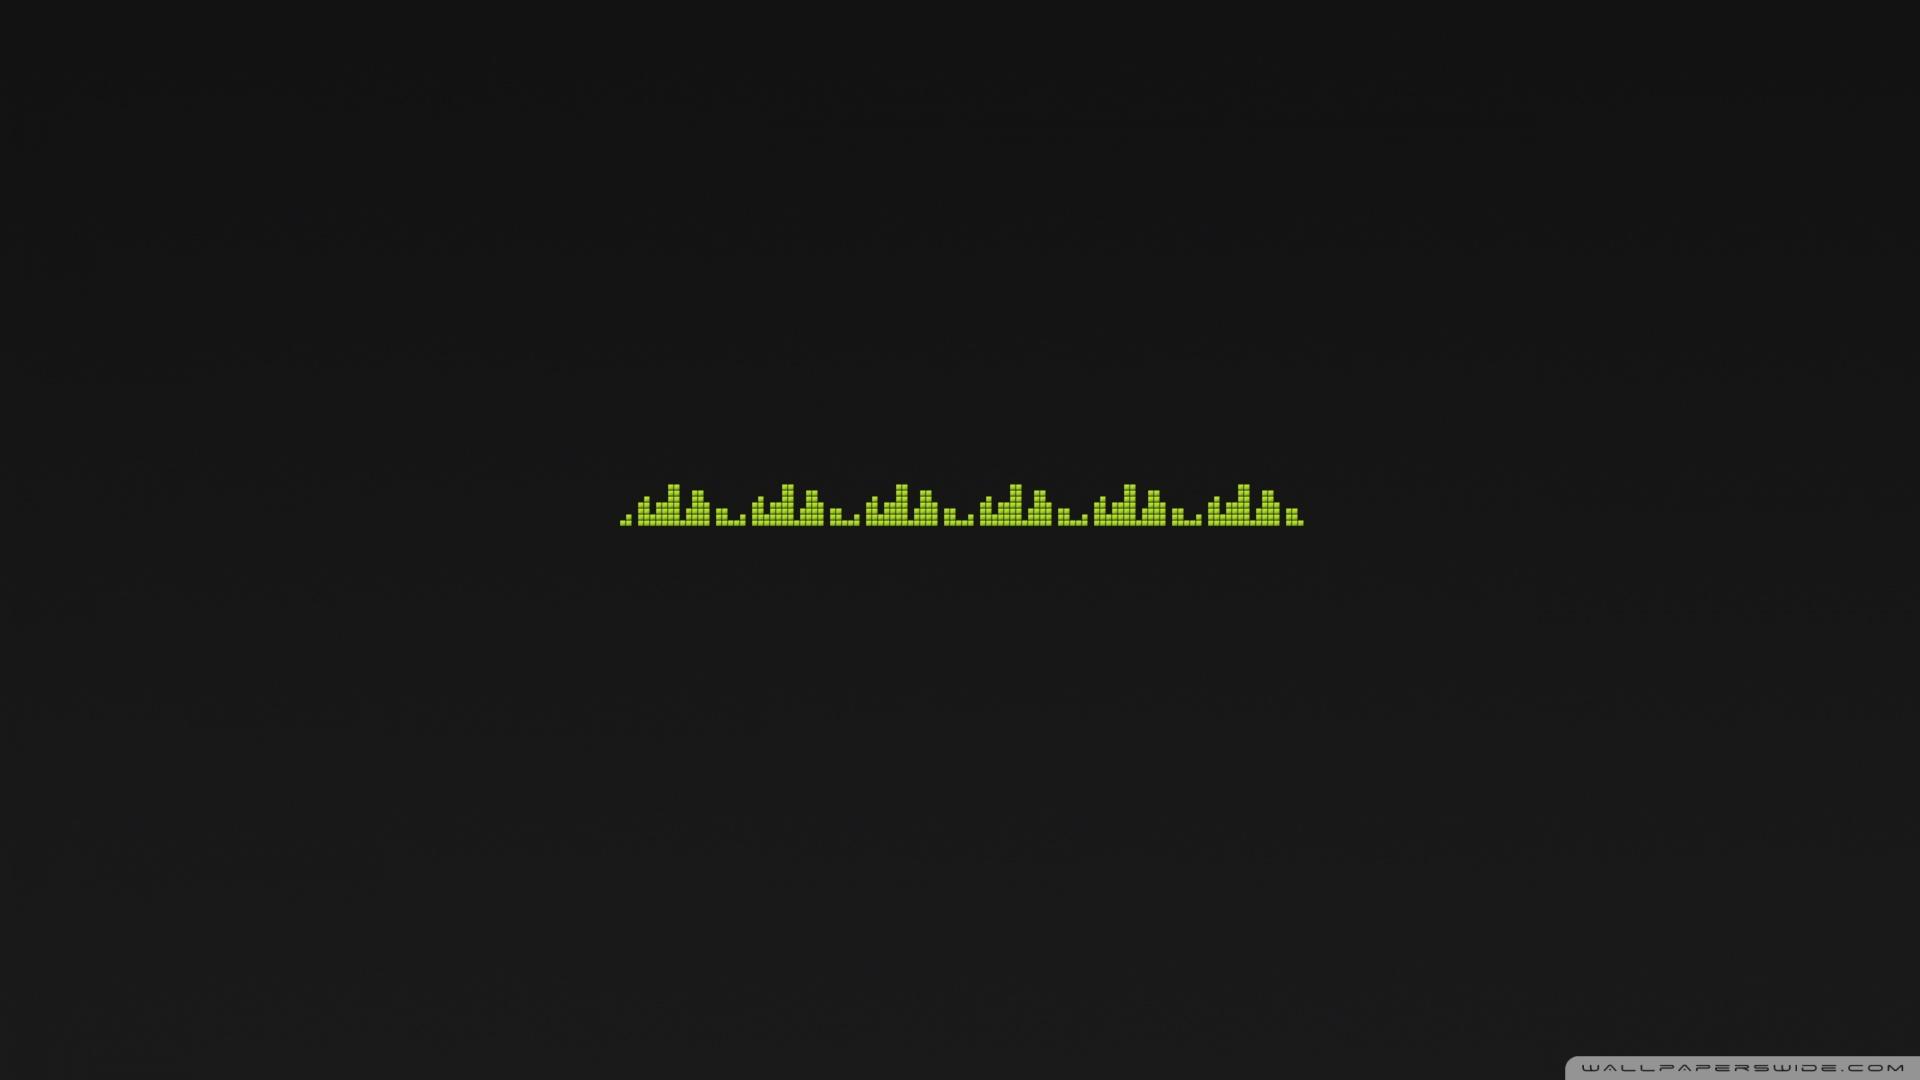 Sound Of Music Wallpaper 1920x1080 Sound Of Music 1920x1080